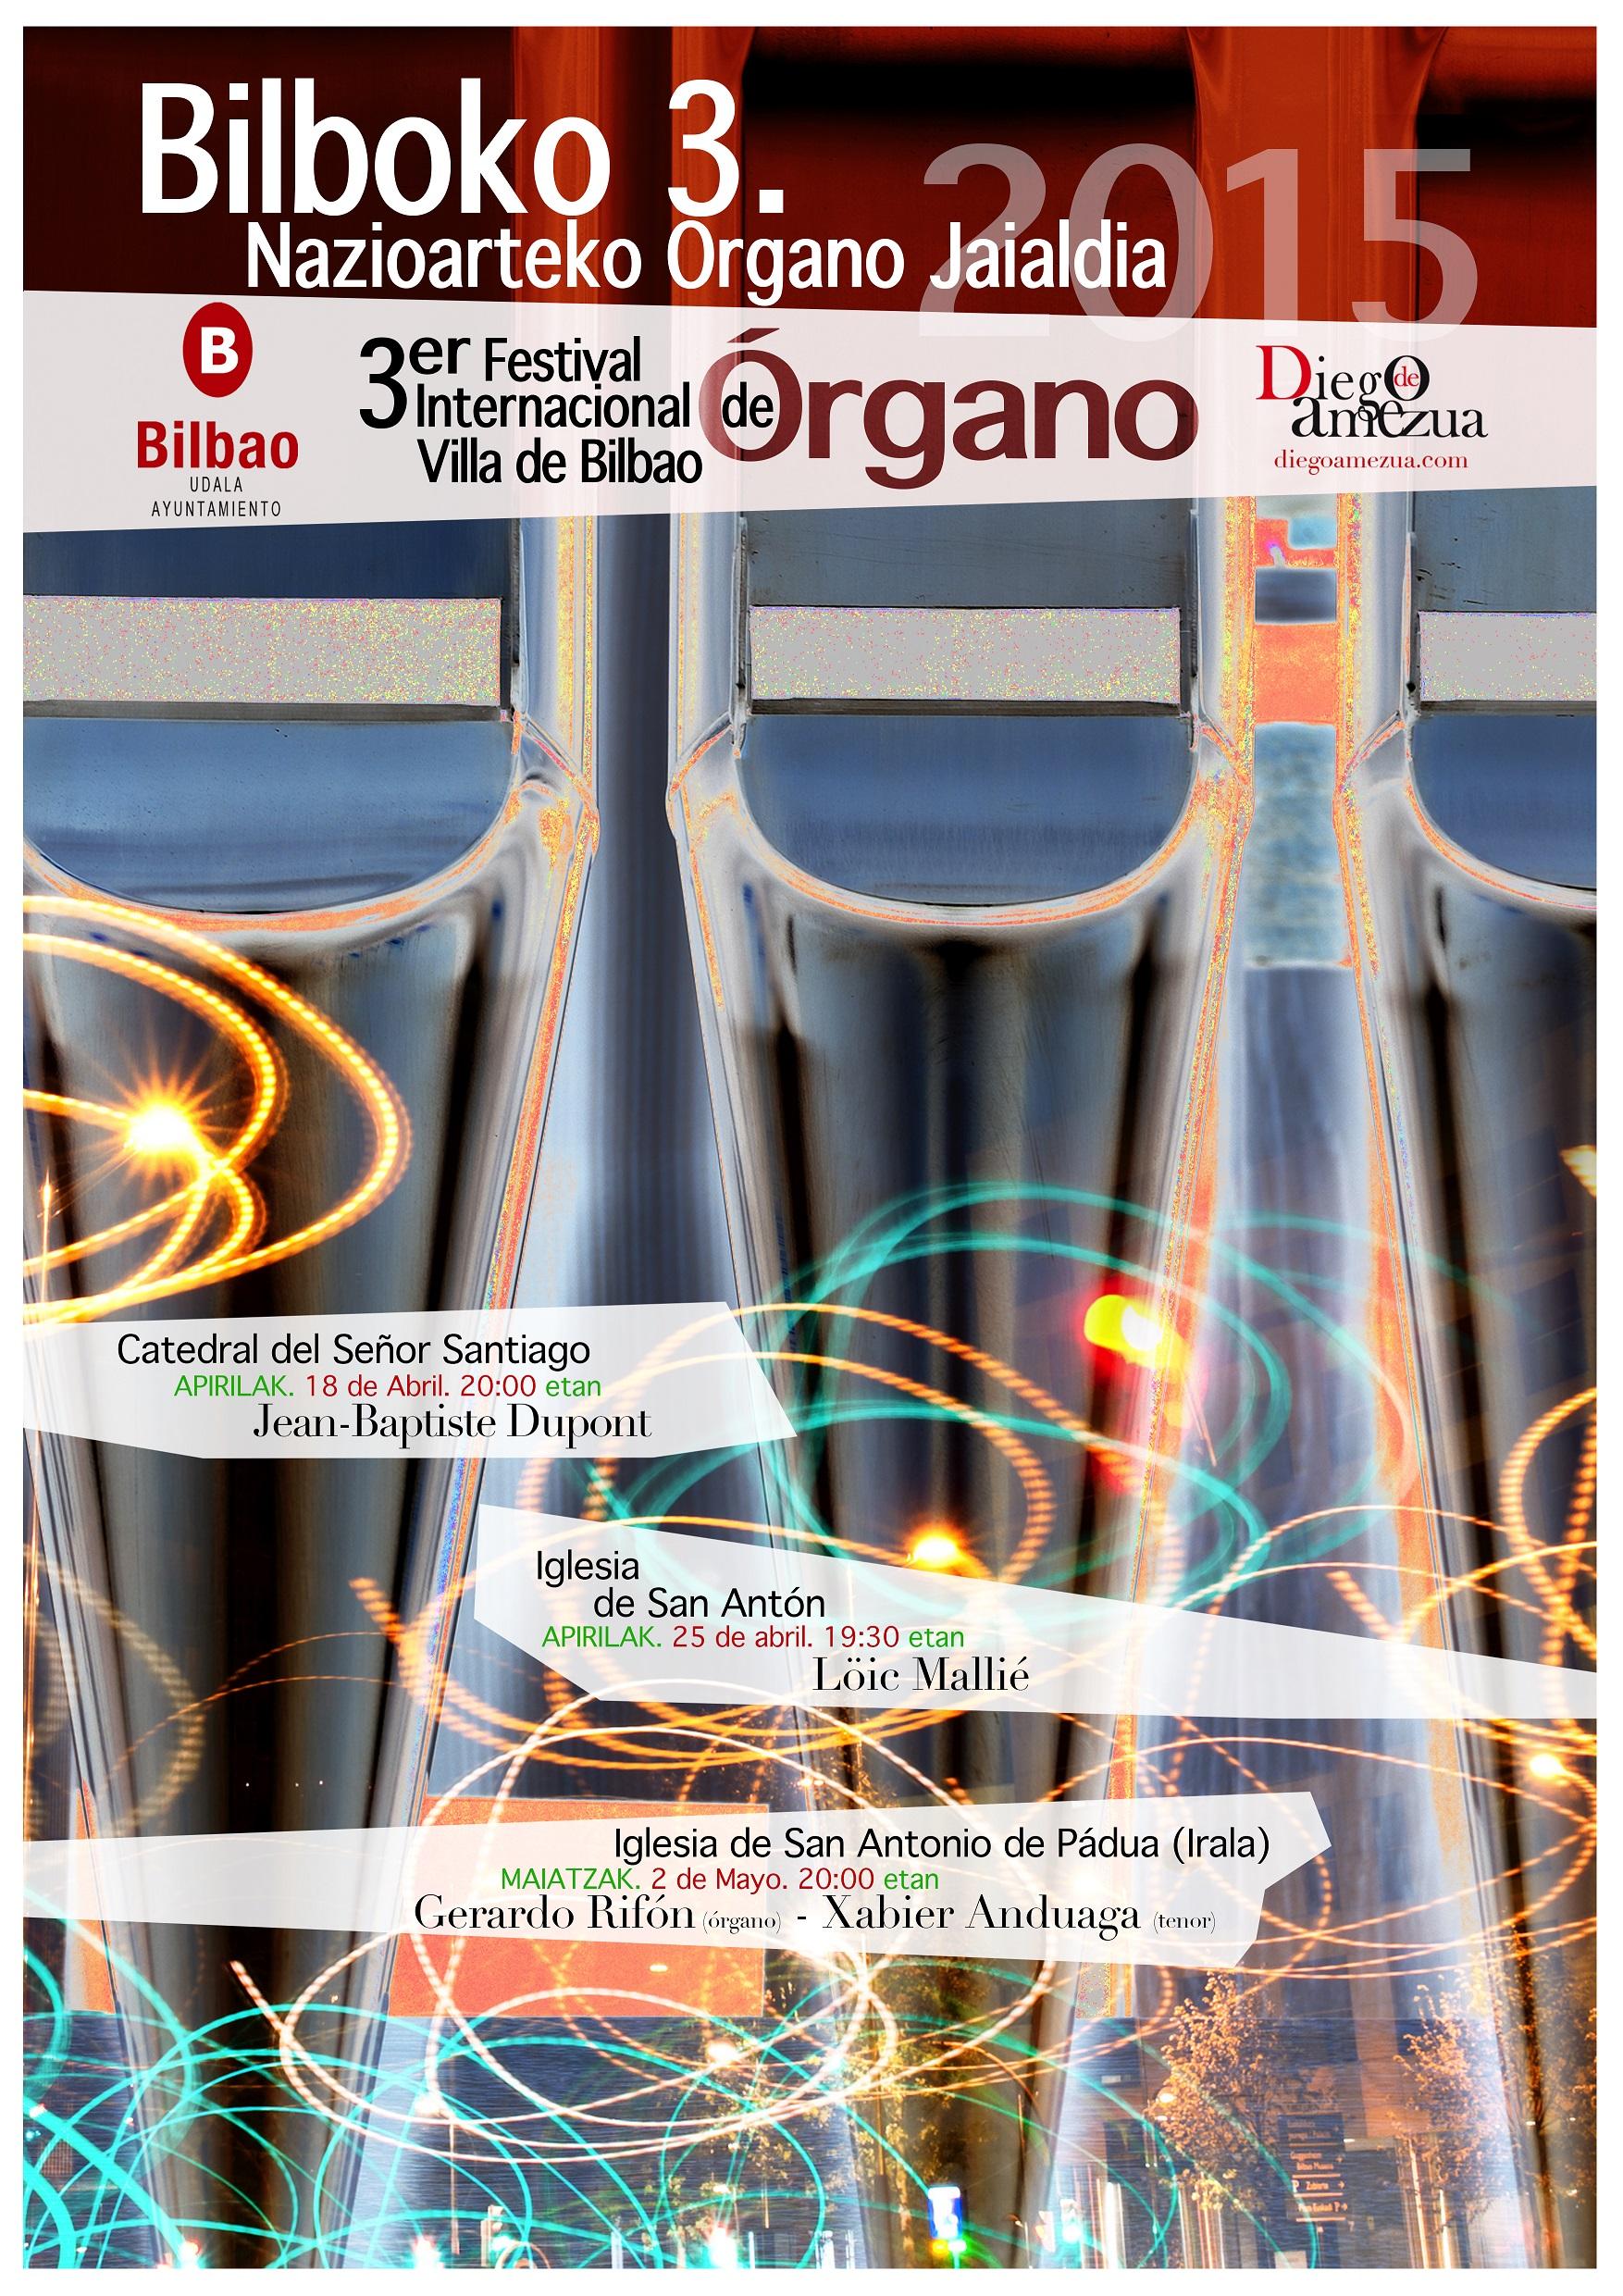 3er Festival Internacional de Órgano Villa de Bilbao - Bilboko 3. Nazioarteko Organo Jaialdia - 2015